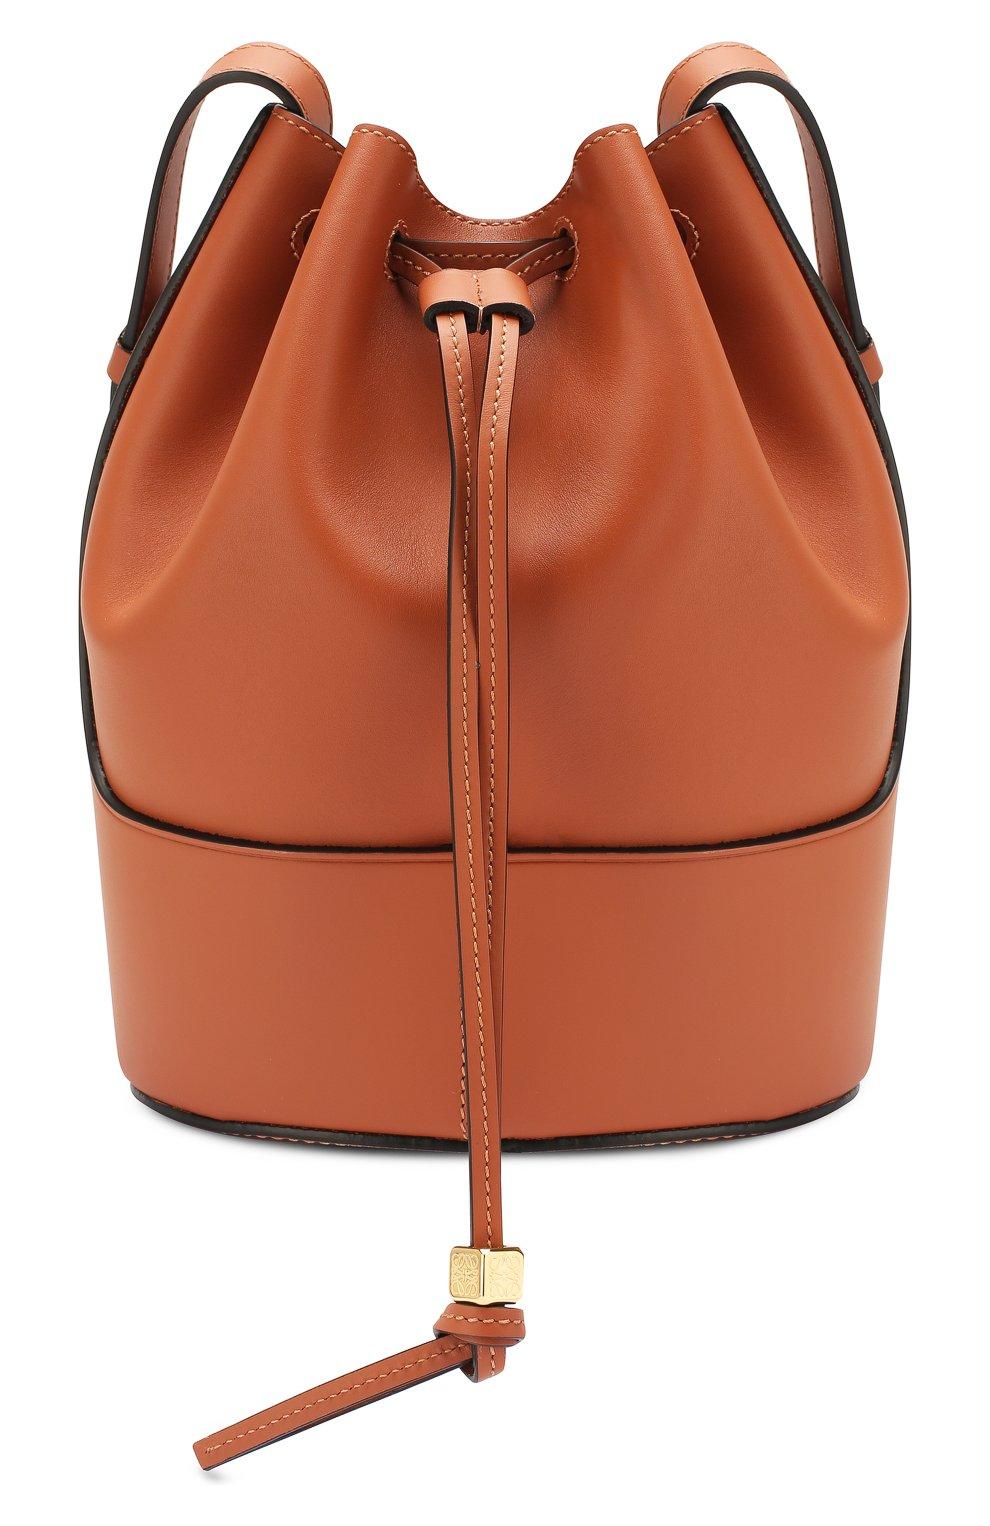 Женская сумка balloon small LOEWE светло-коричневого цвета, арт. 326.75AC31   Фото 1 (Сумки-технические: Сумки через плечо; Материал: Натуральная кожа; Ремень/цепочка: На ремешке; Размер: small)